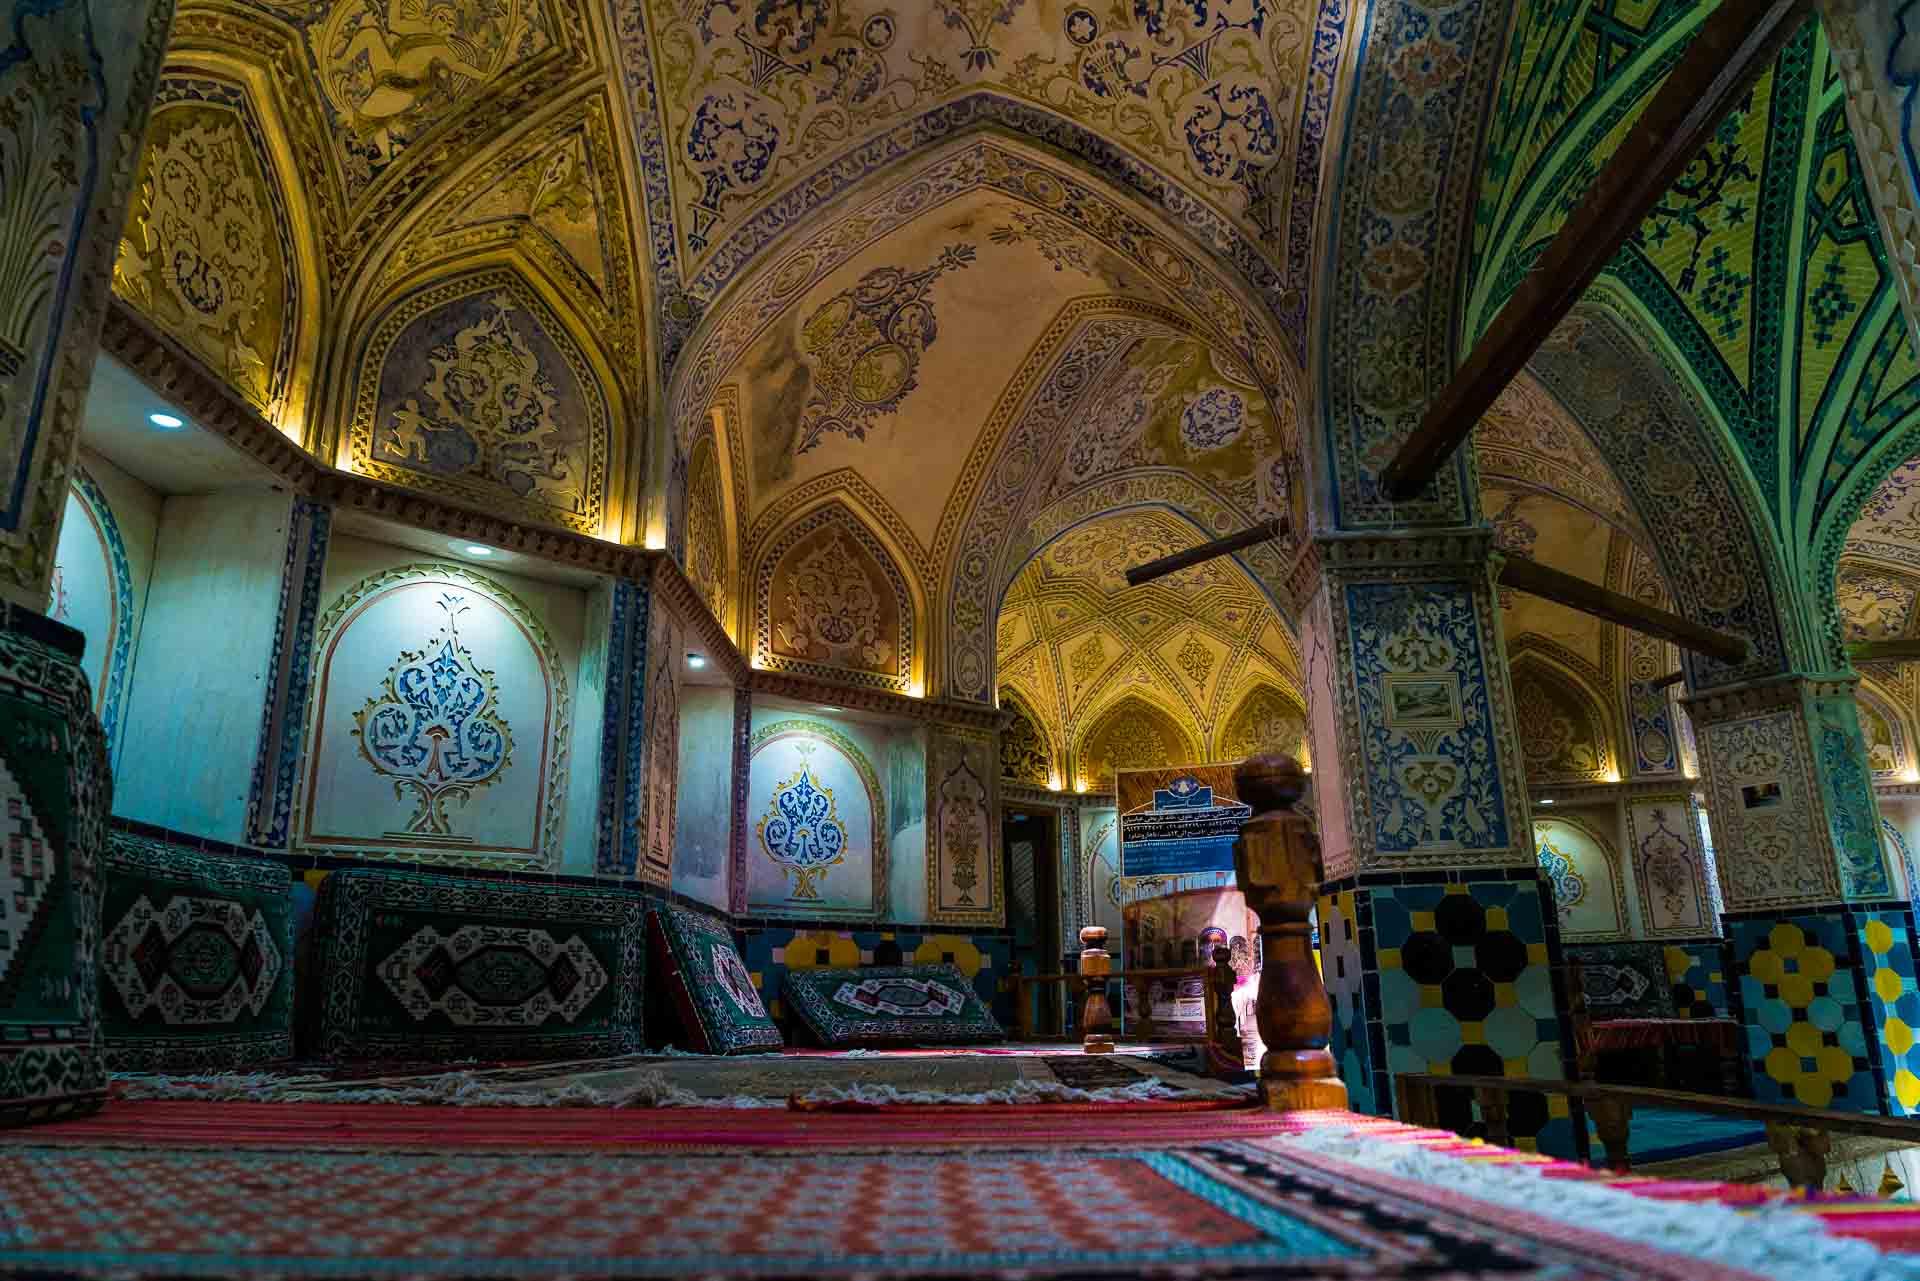 Sultan Amir Ahmad Bathhouse seats, kashan, iran, pescart, photo blog, travel blog, blog, photo travel blog, enrico pescantini, pescantini